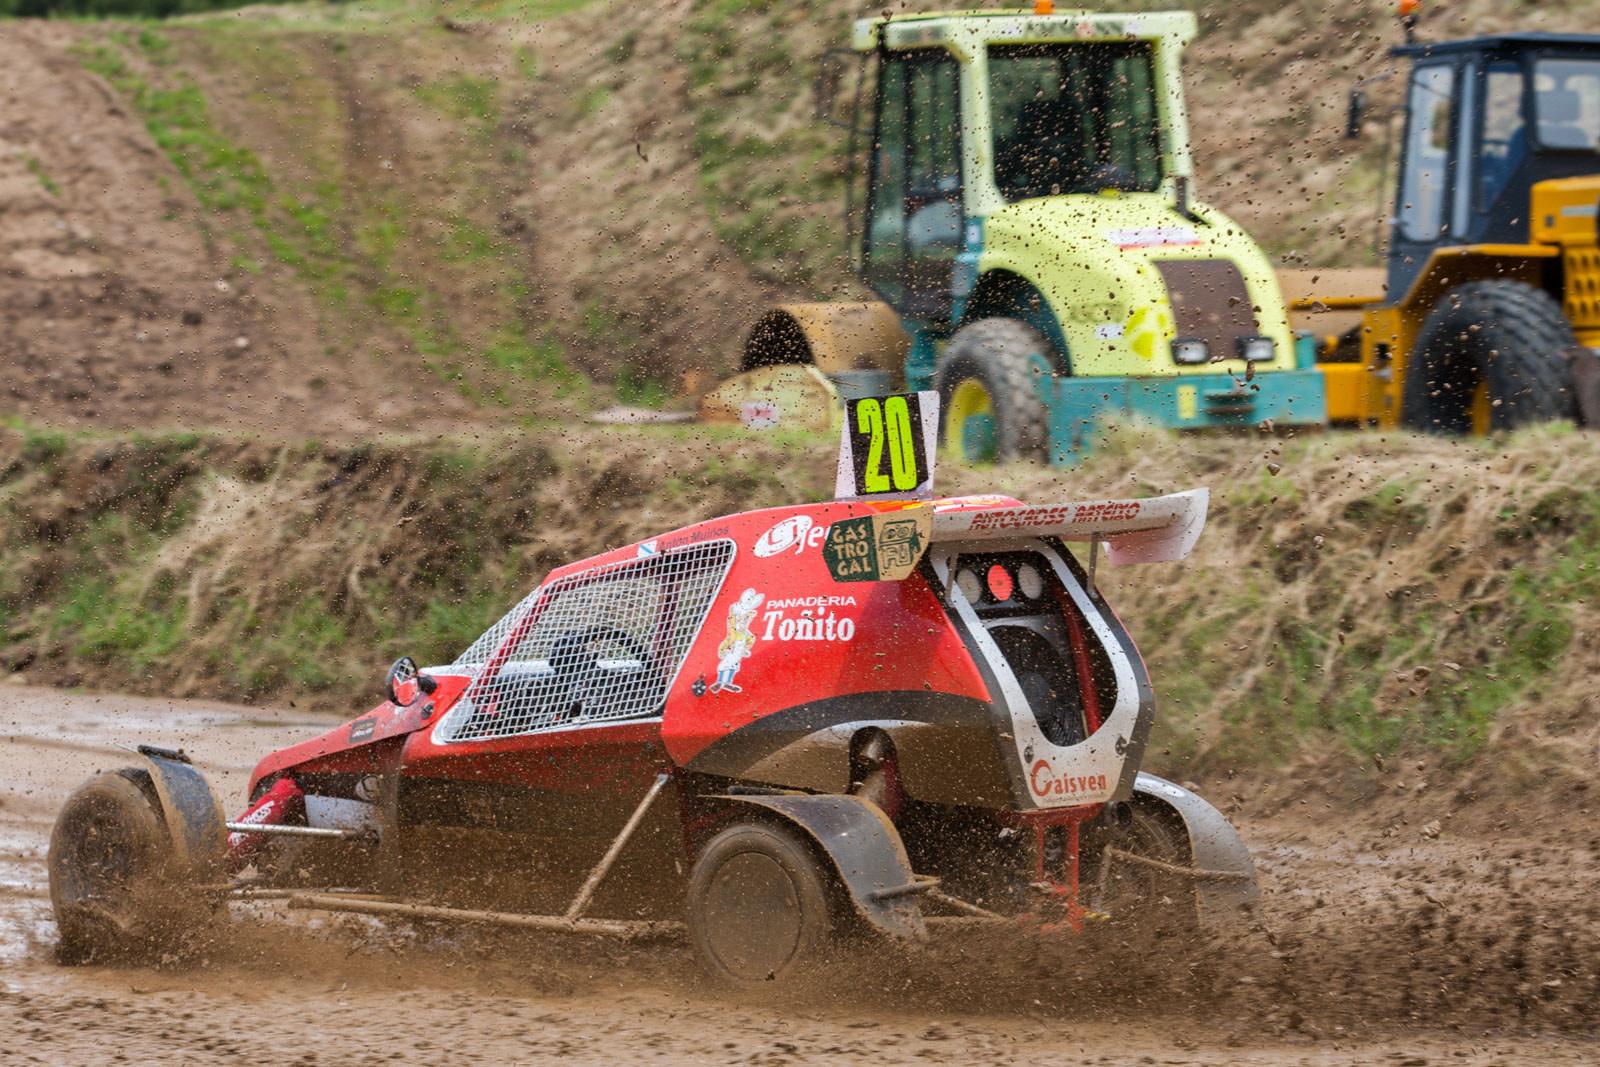 005 Autocross Carballo FGA 2016 011